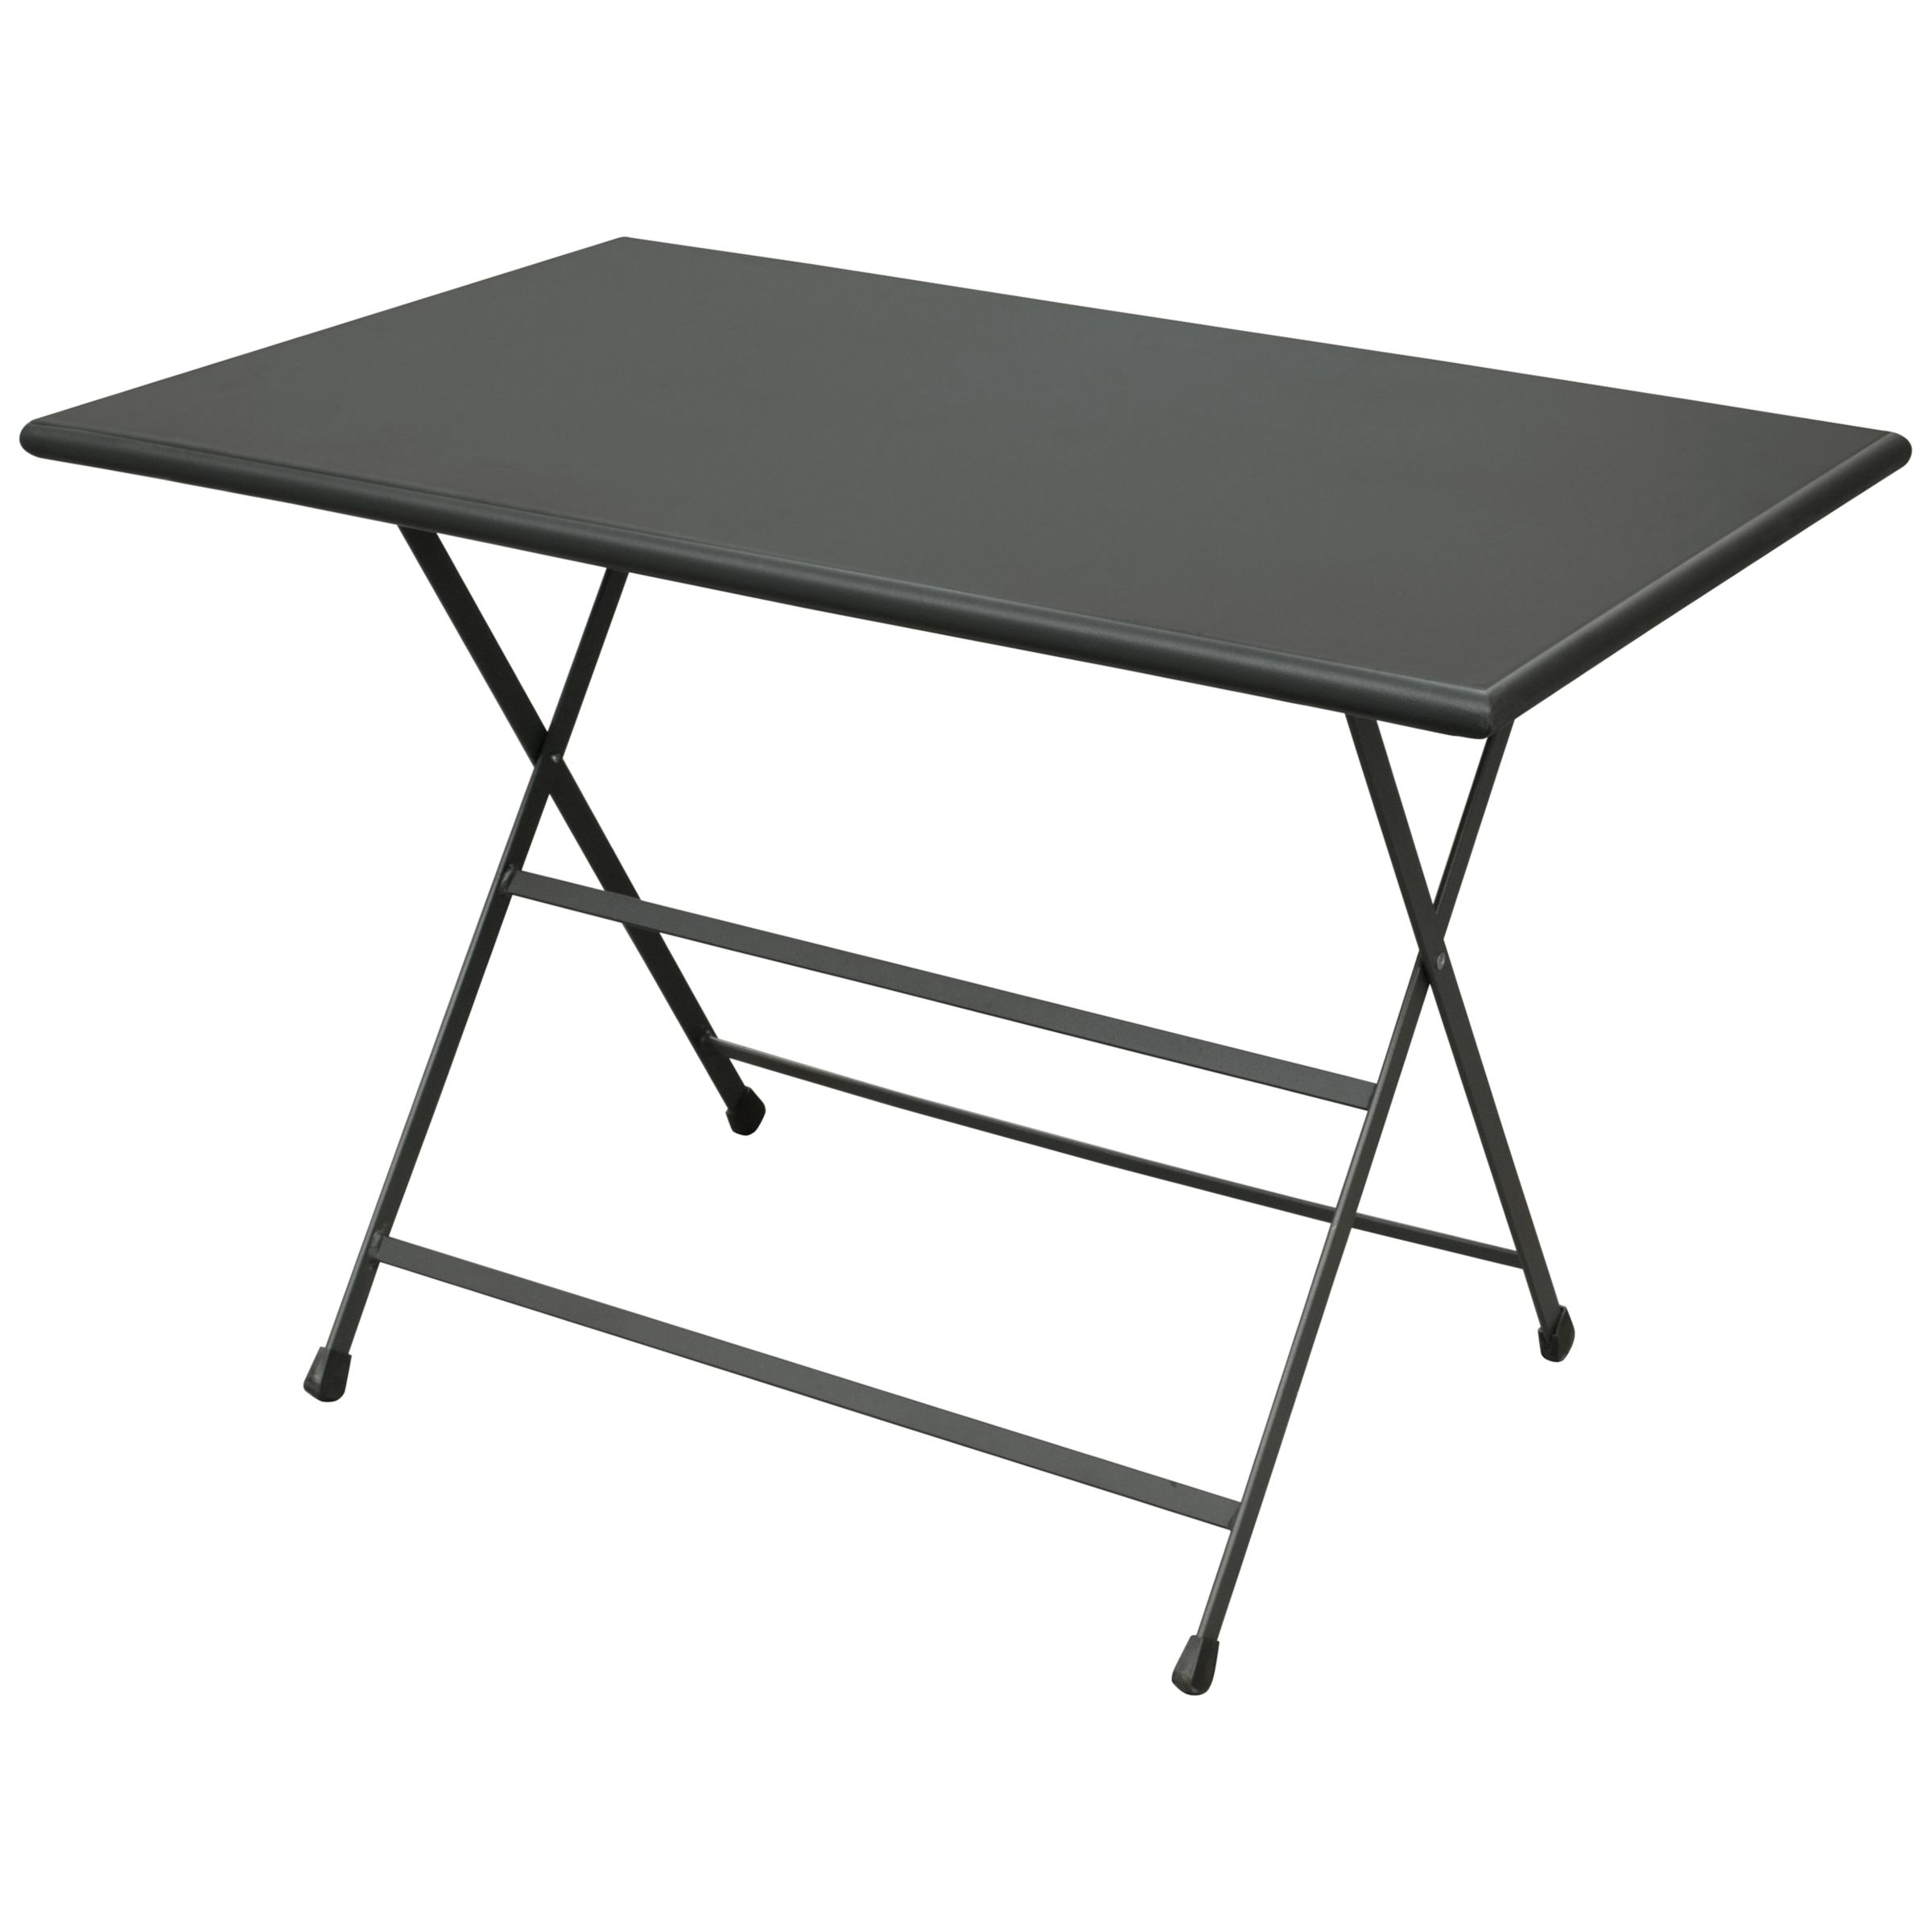 EMU Arc En Ciel Rectangular 4 Seater Outdoor Dining Table, Iron